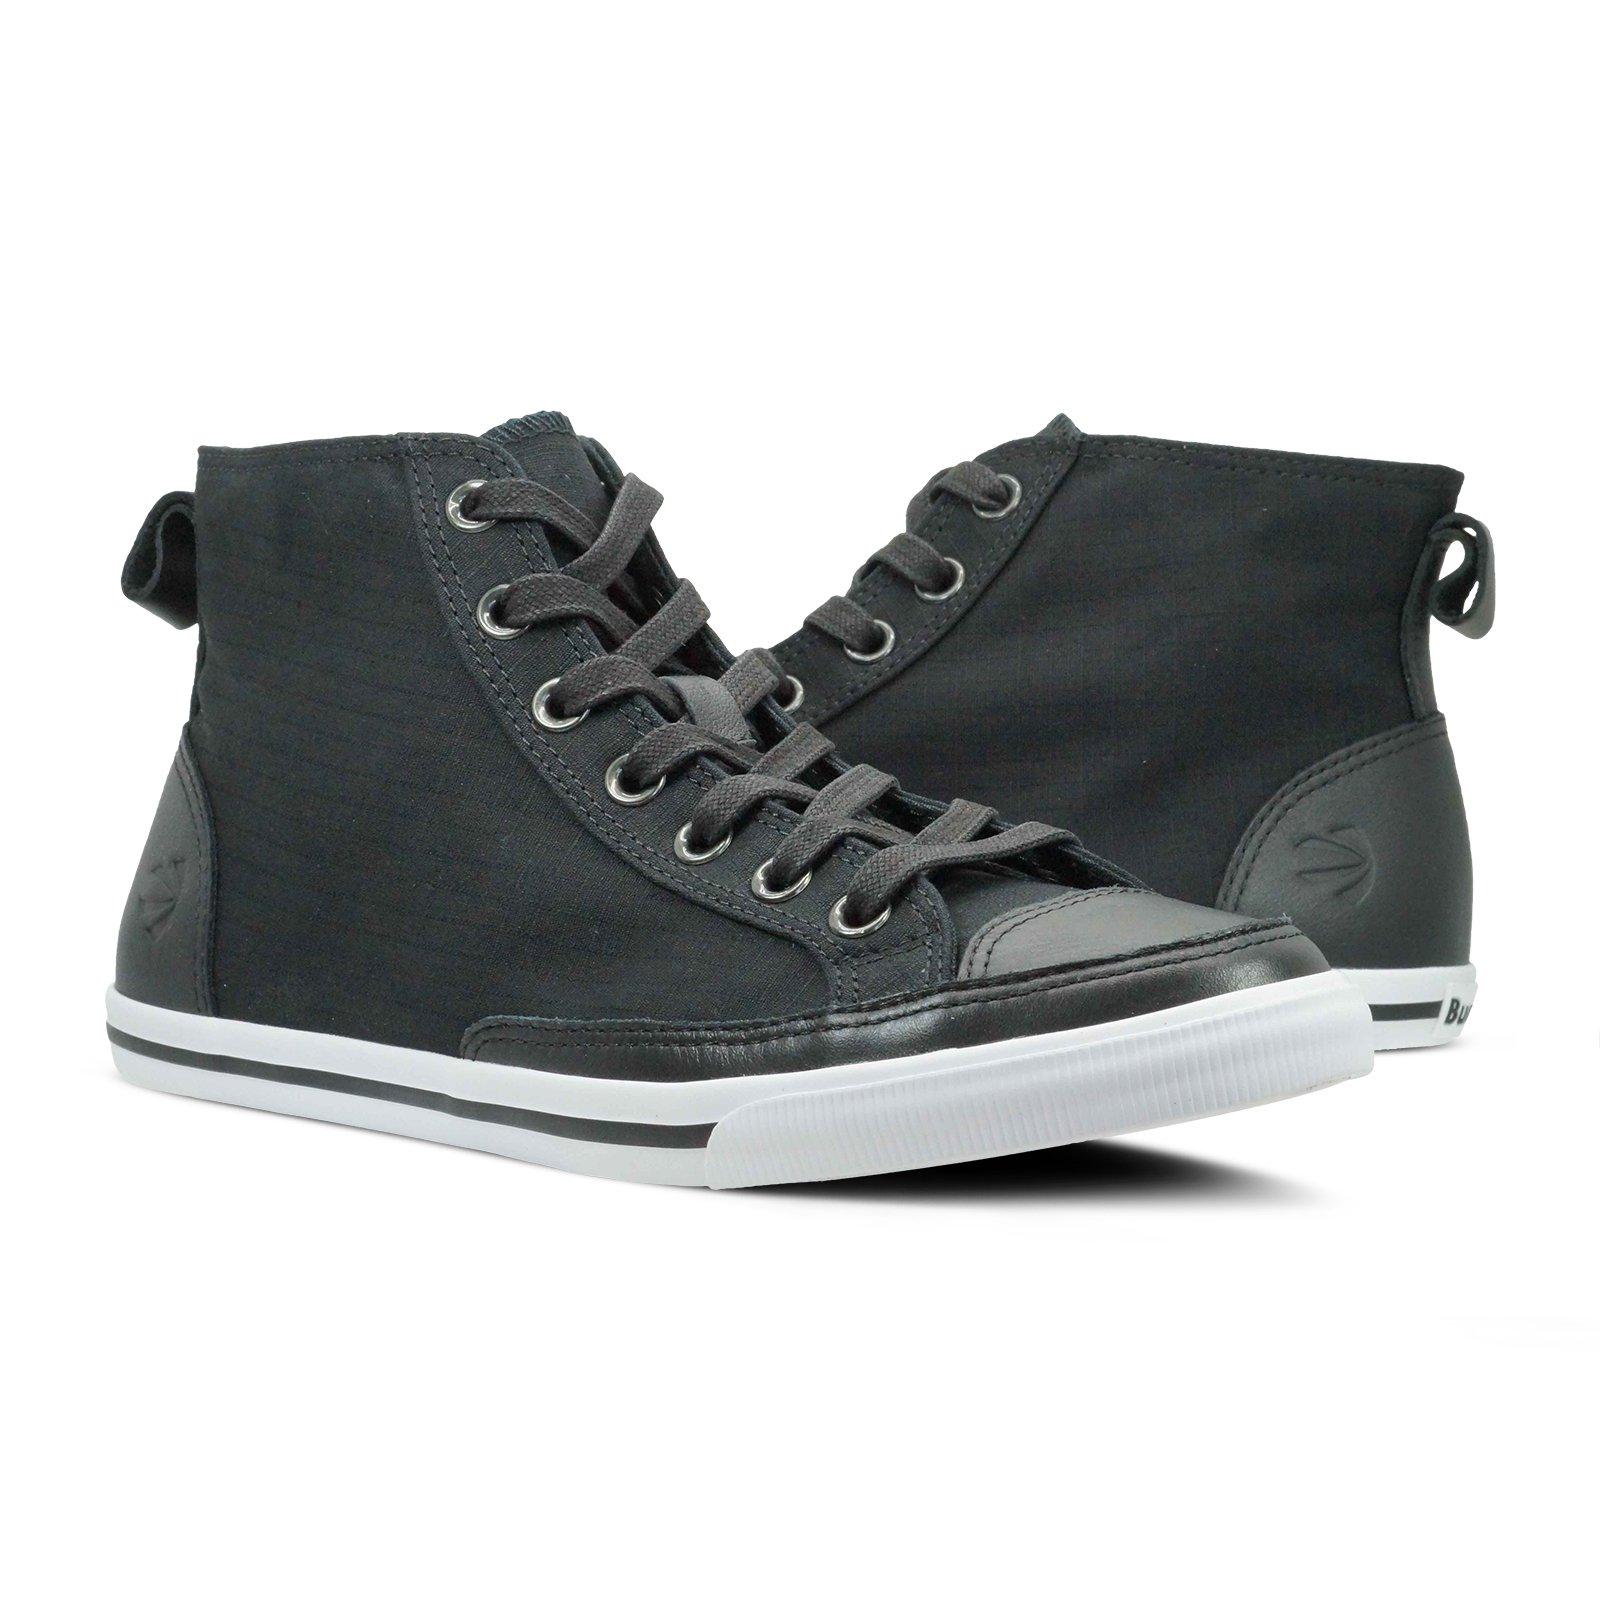 Burnetie Men's Black Solid Plaid High Top Vintage Sneaker 10 M US